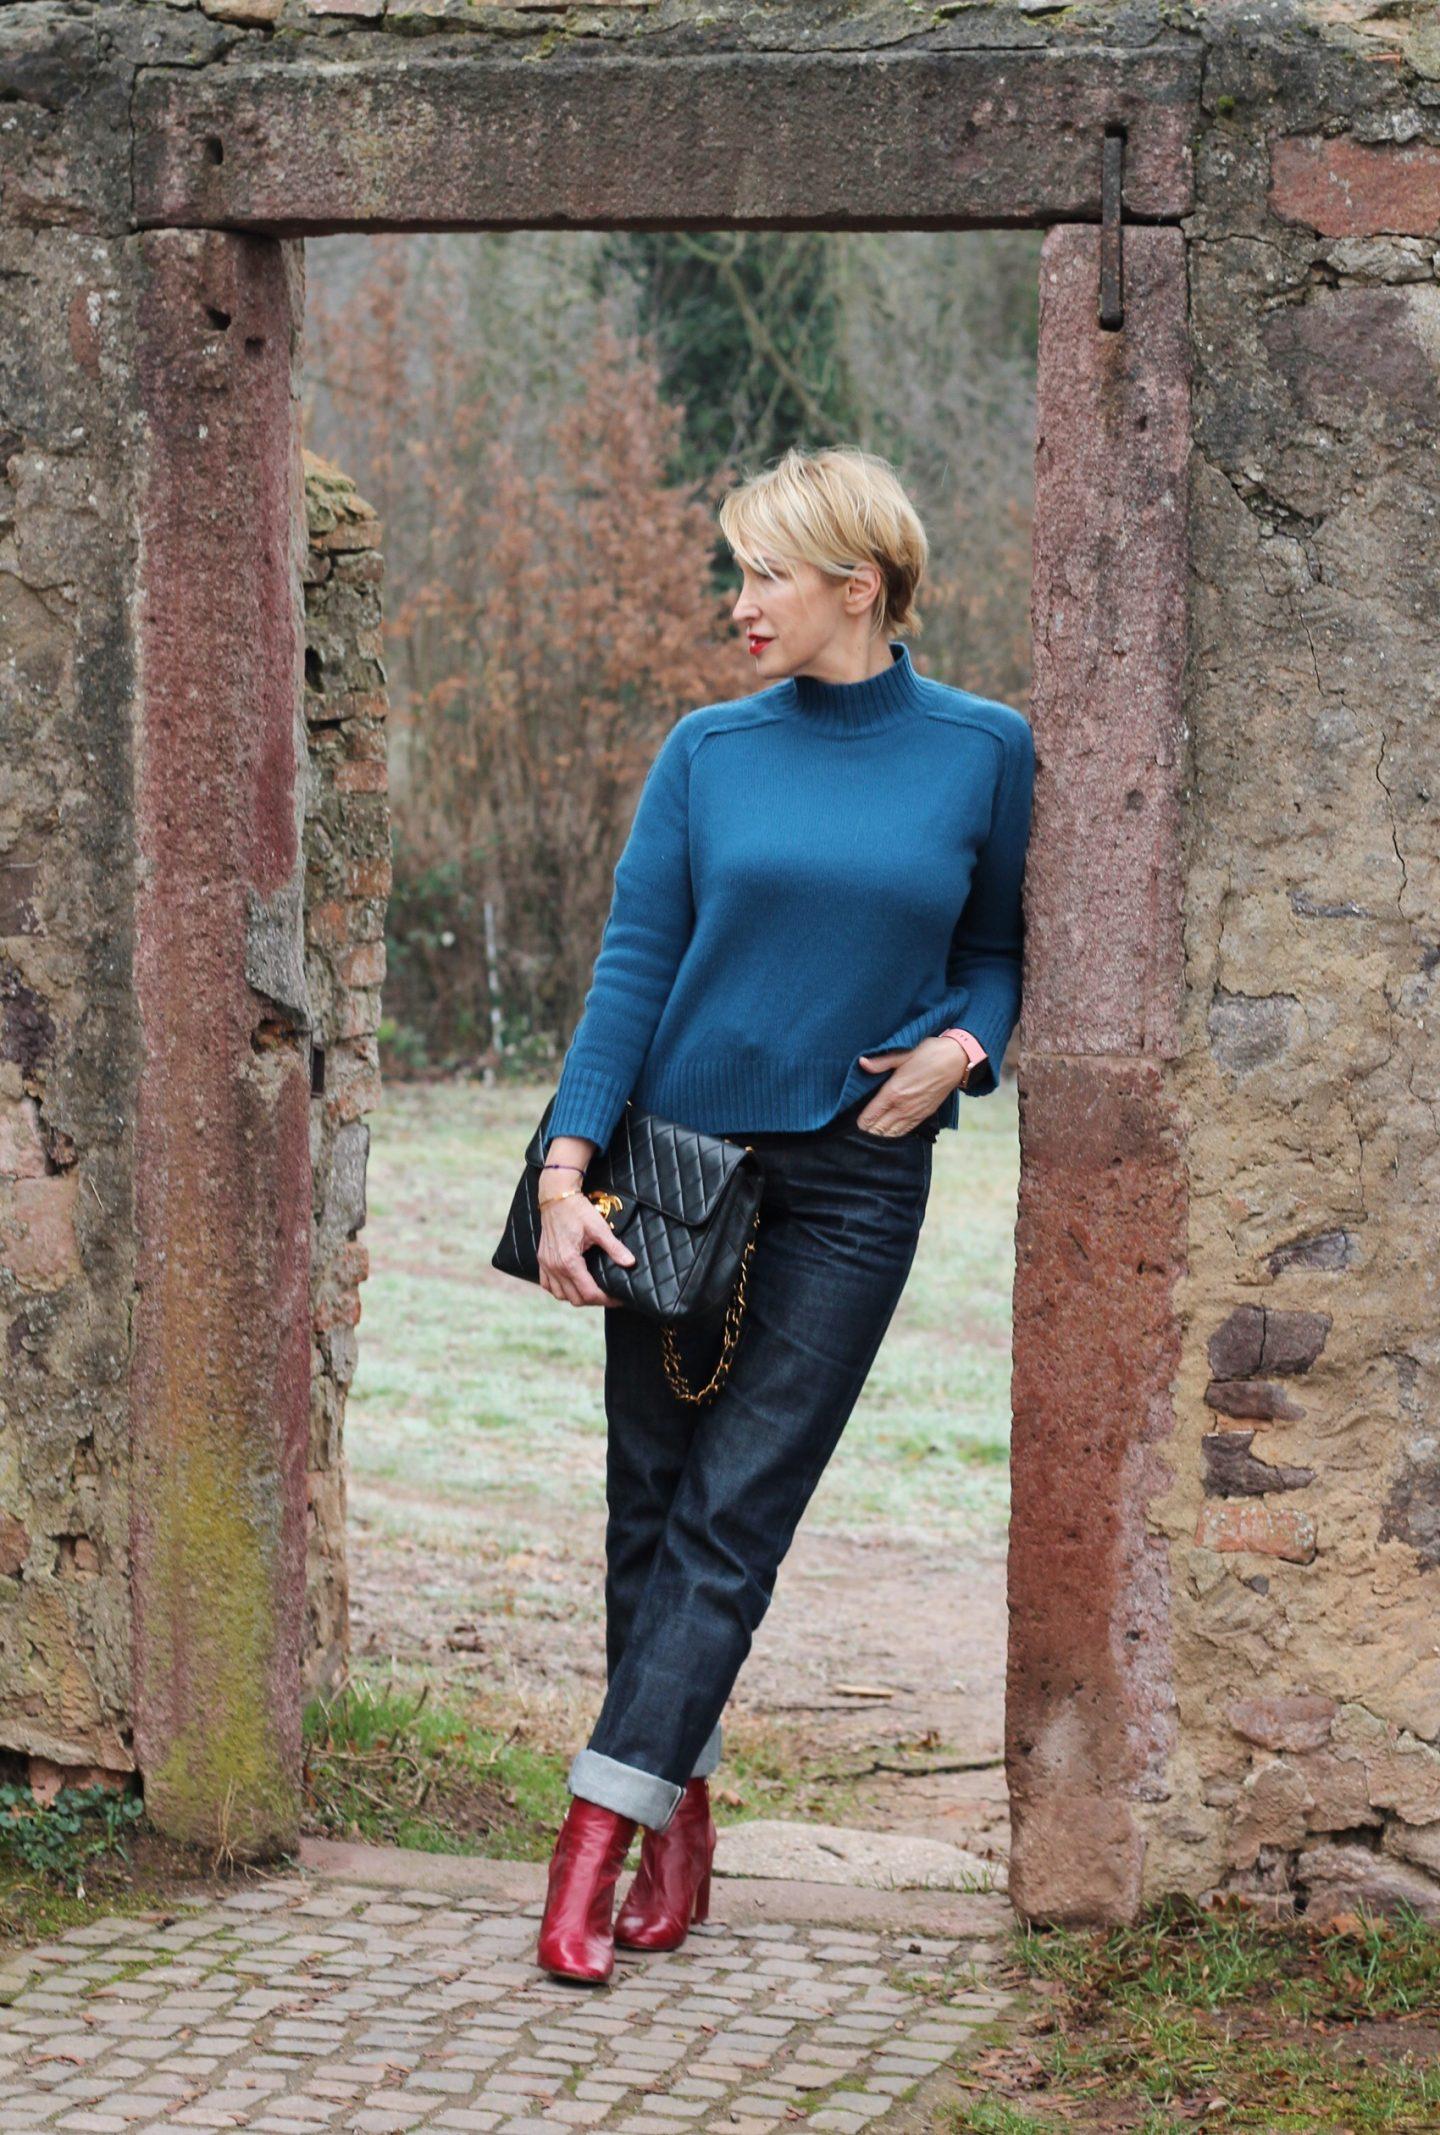 glamupyourlifestyle rollkragenpullover Kaschmir Kaschmir-Pullover Chanel-Vintage ü-40-blog ü-50-blog